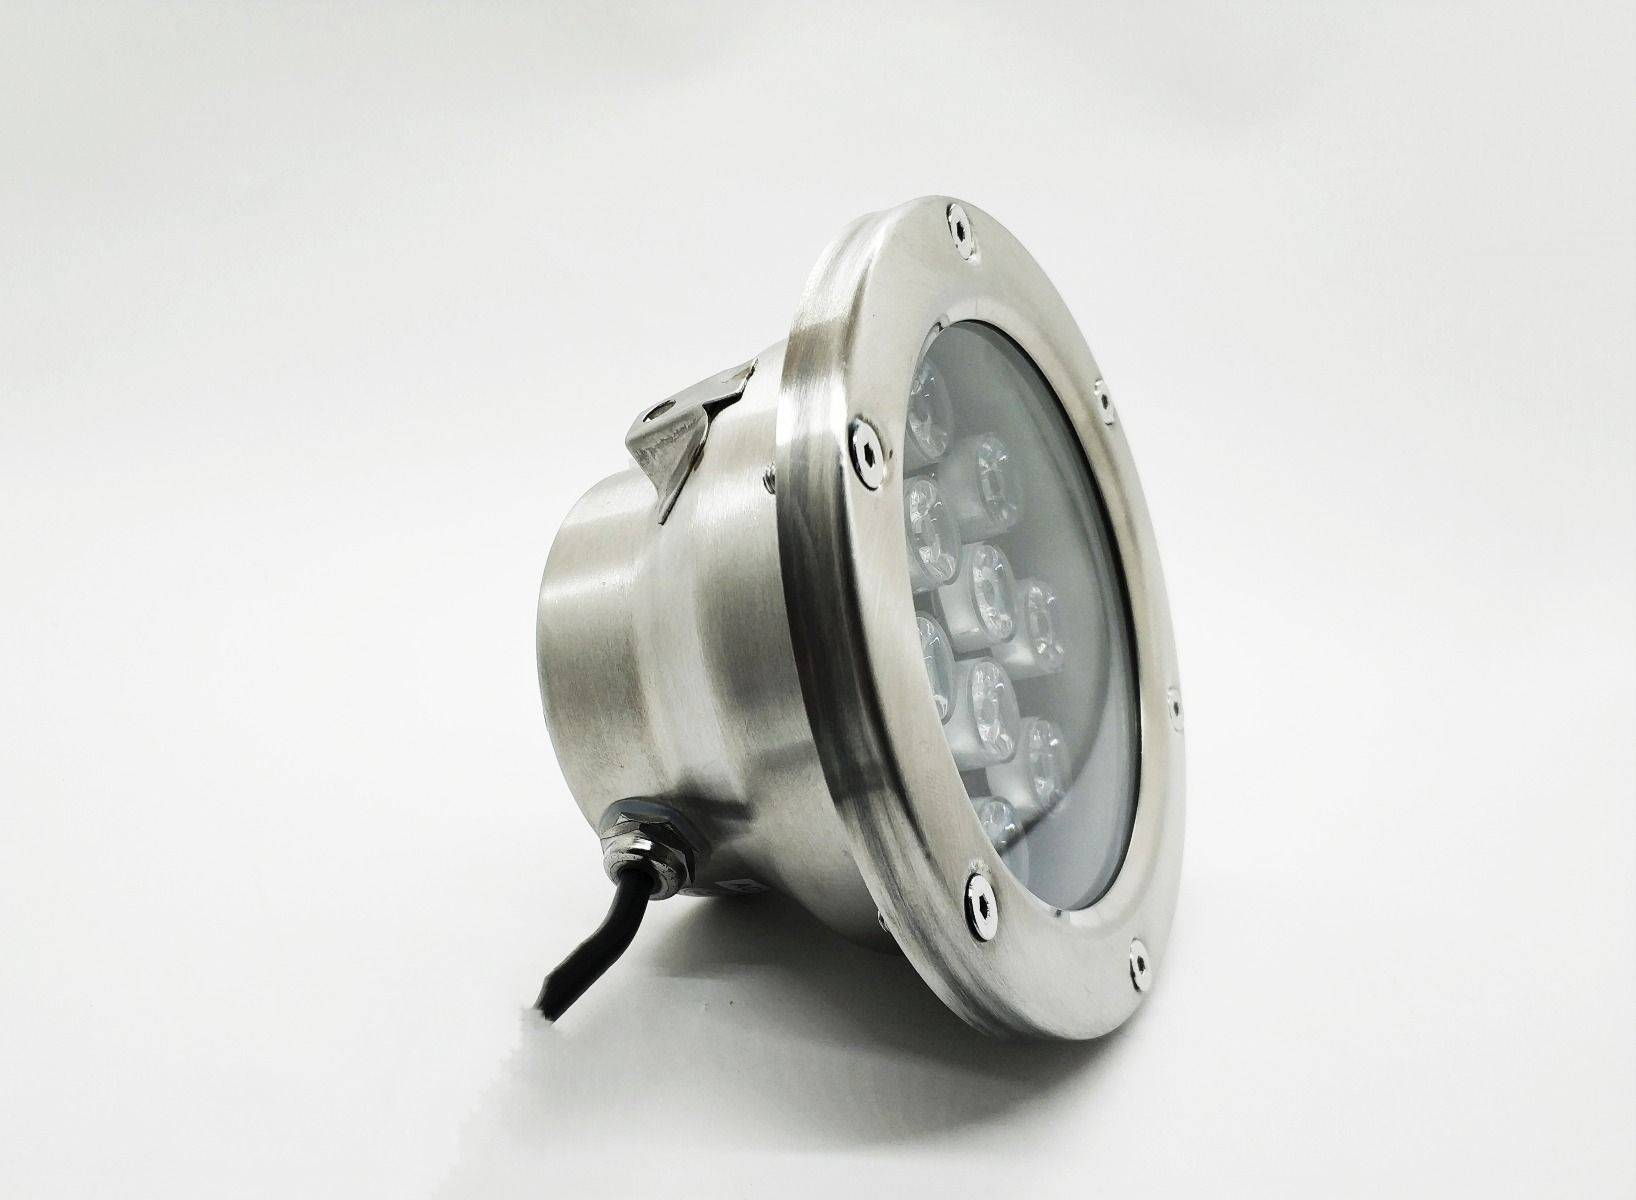 Ecolite®POOL-12PLUNGERGB LED Swimming Pool Bulb